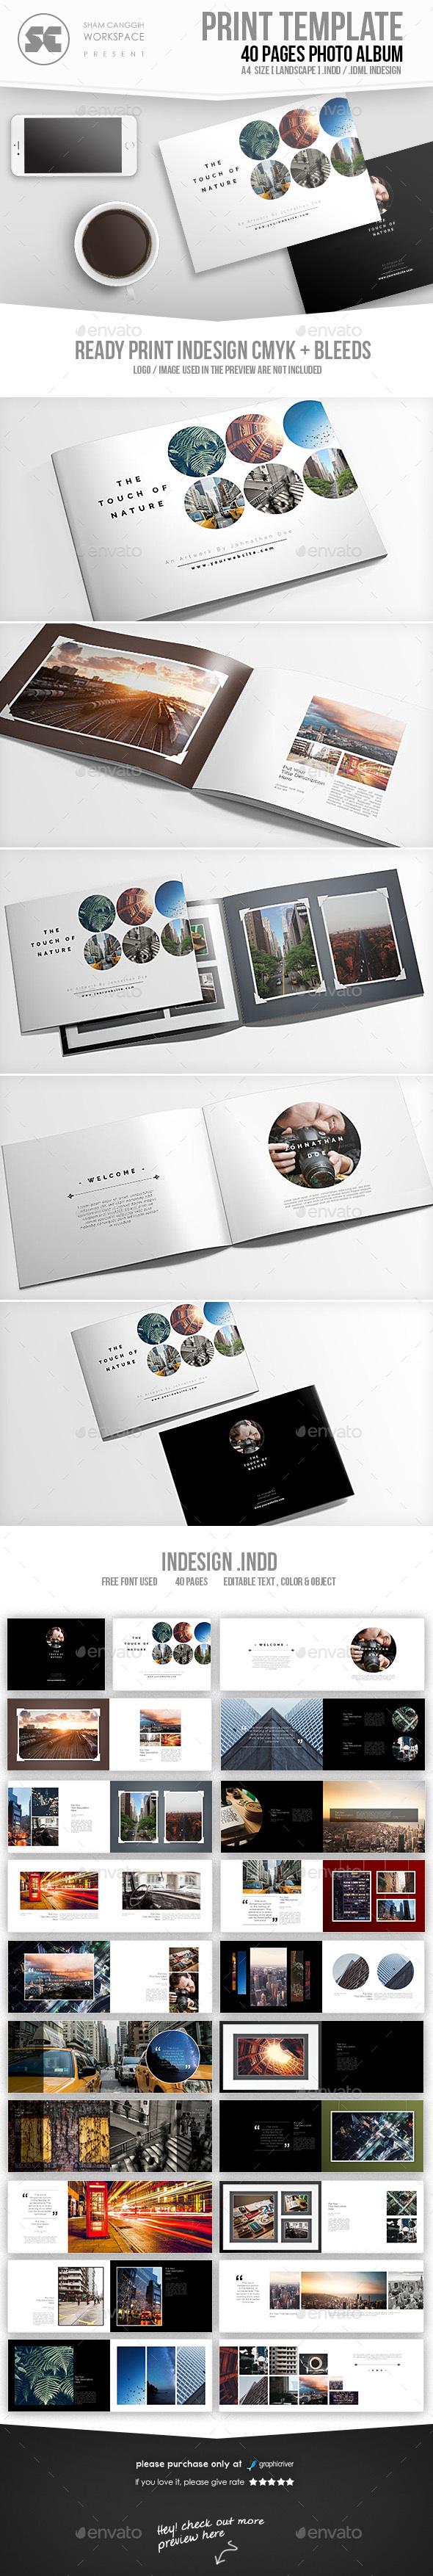 Photo Album Booklet - Photo Albums Print Templates